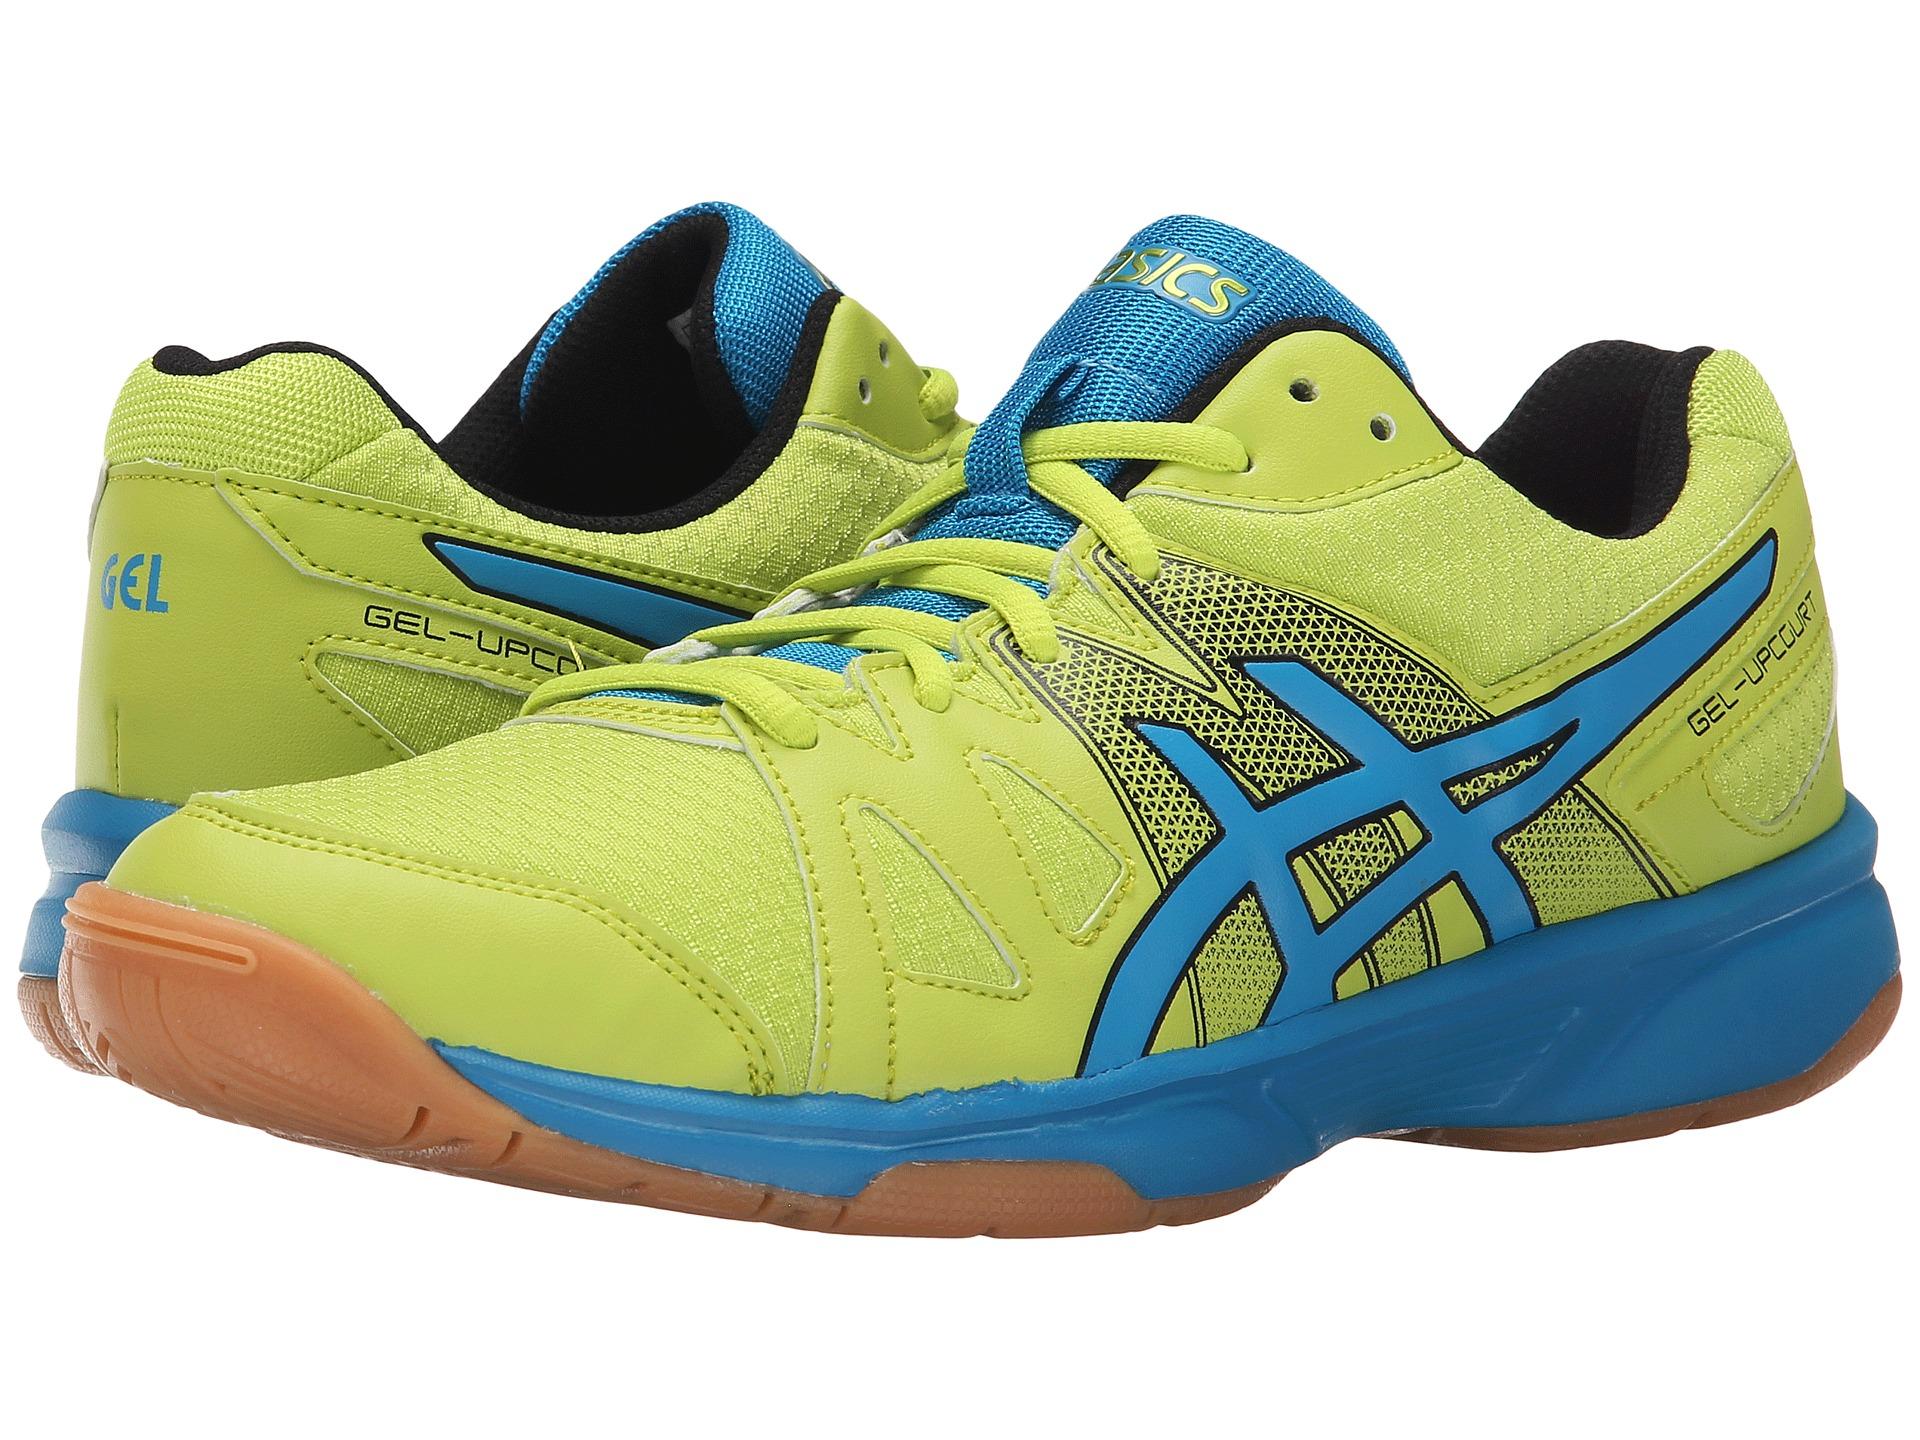 Asics Gel Upcourt  Men S Court Shoes